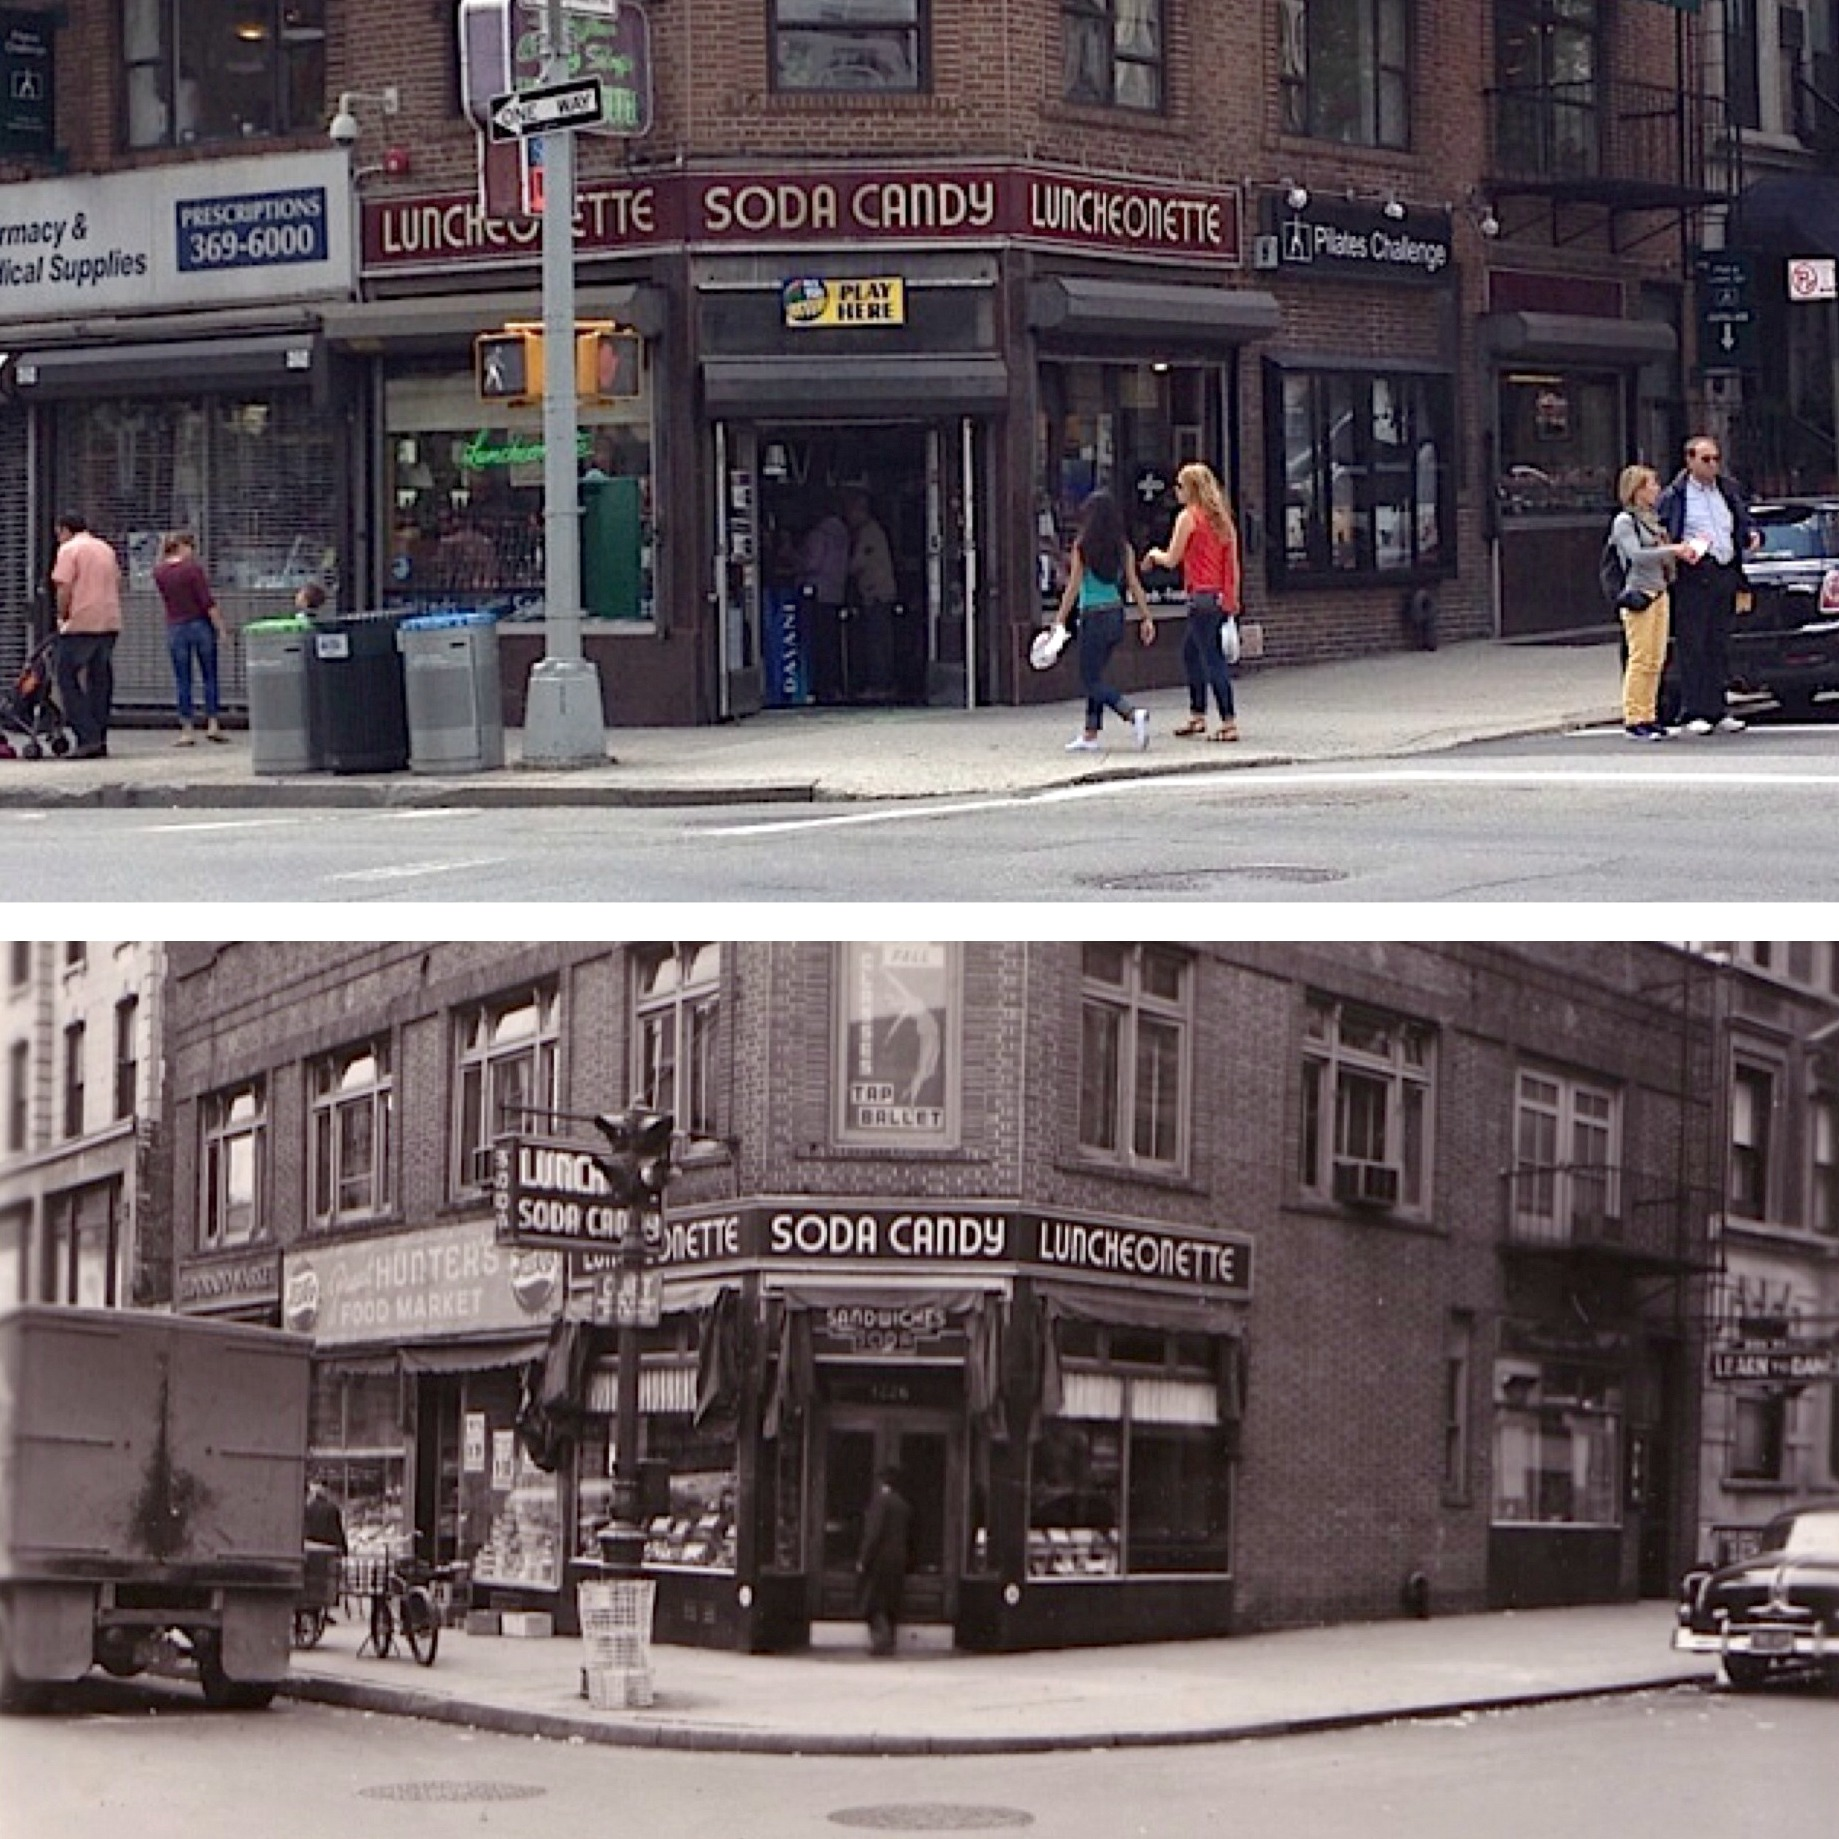 NYC luncheonette, Lexington Candy Shop, historic NYC businesses, John Philis